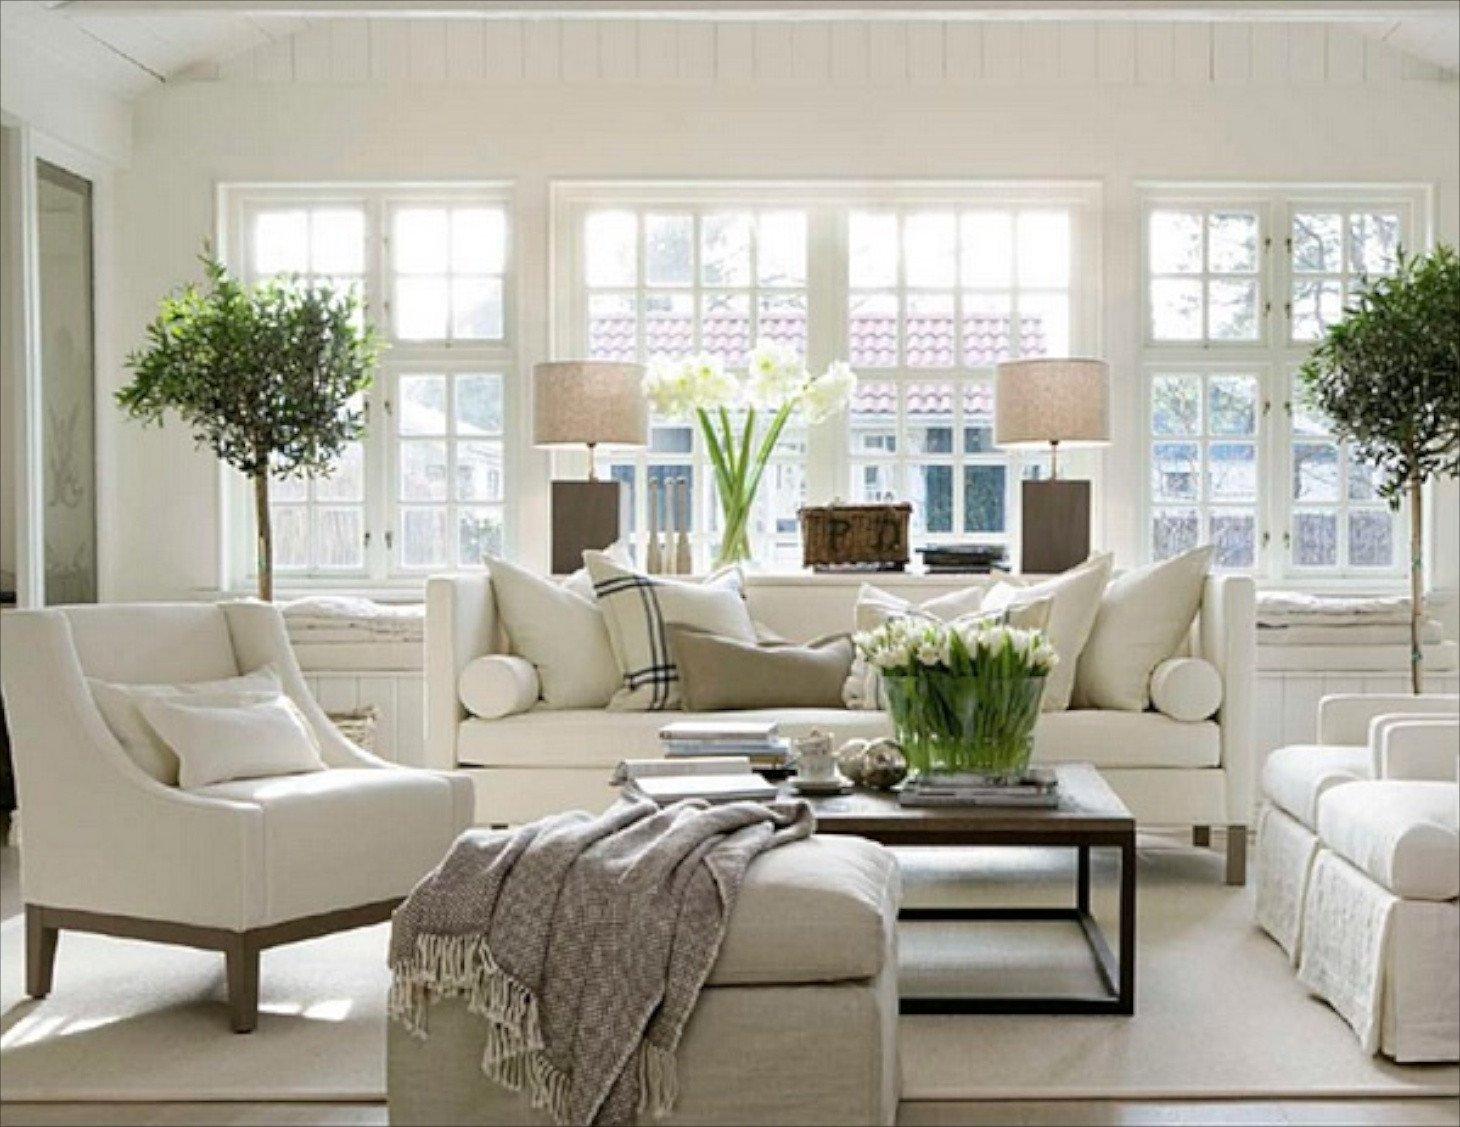 White Traditional Living Room Unique 22 Cozy Traditional Living Room Indoor Plant Modern White Decor Whg